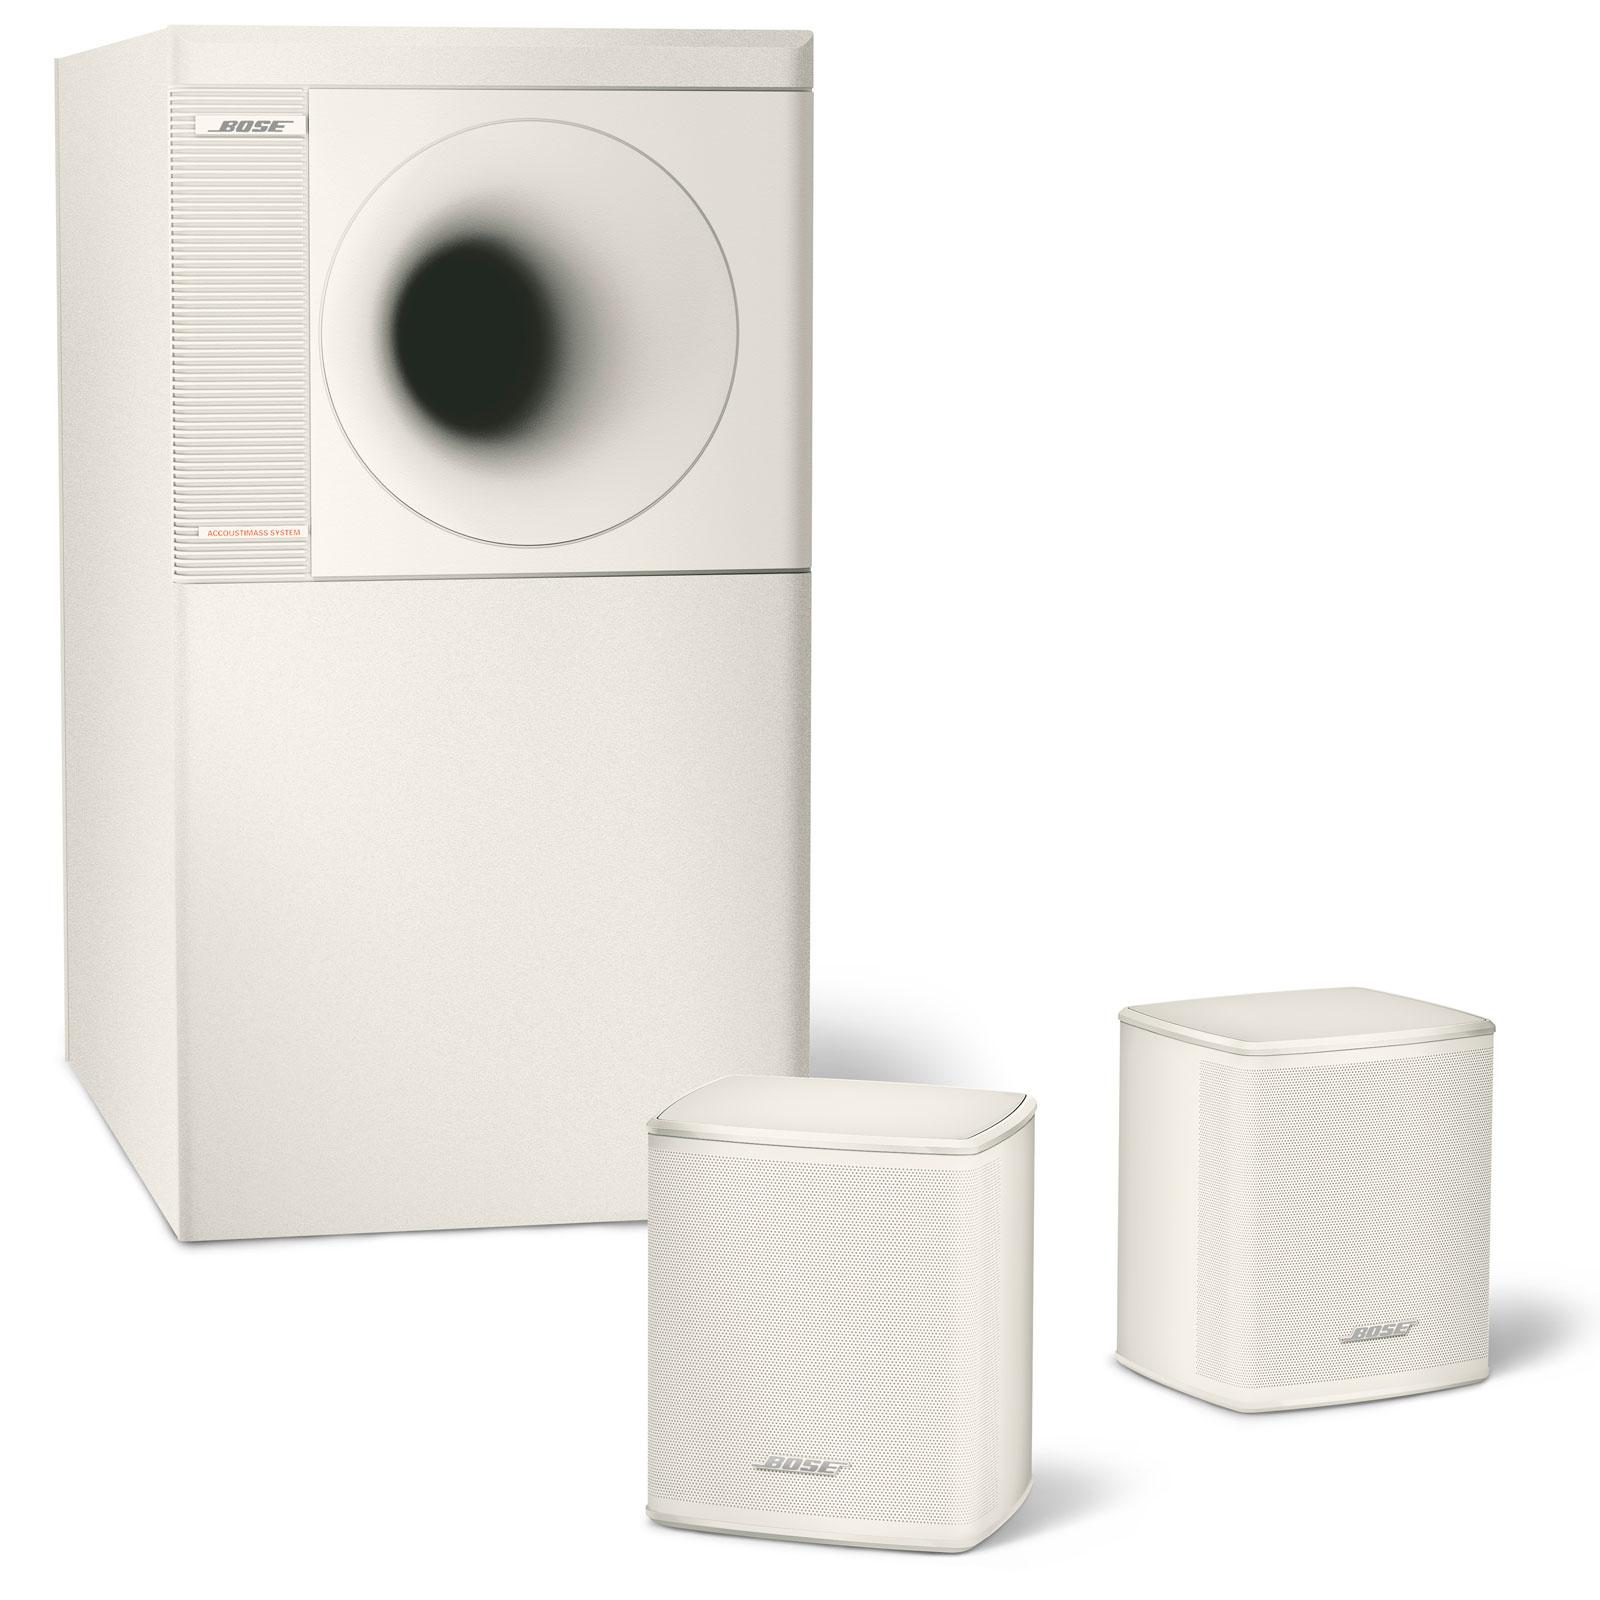 bose acoustimass 3 serie v blanc enceintes hifi bose sur. Black Bedroom Furniture Sets. Home Design Ideas